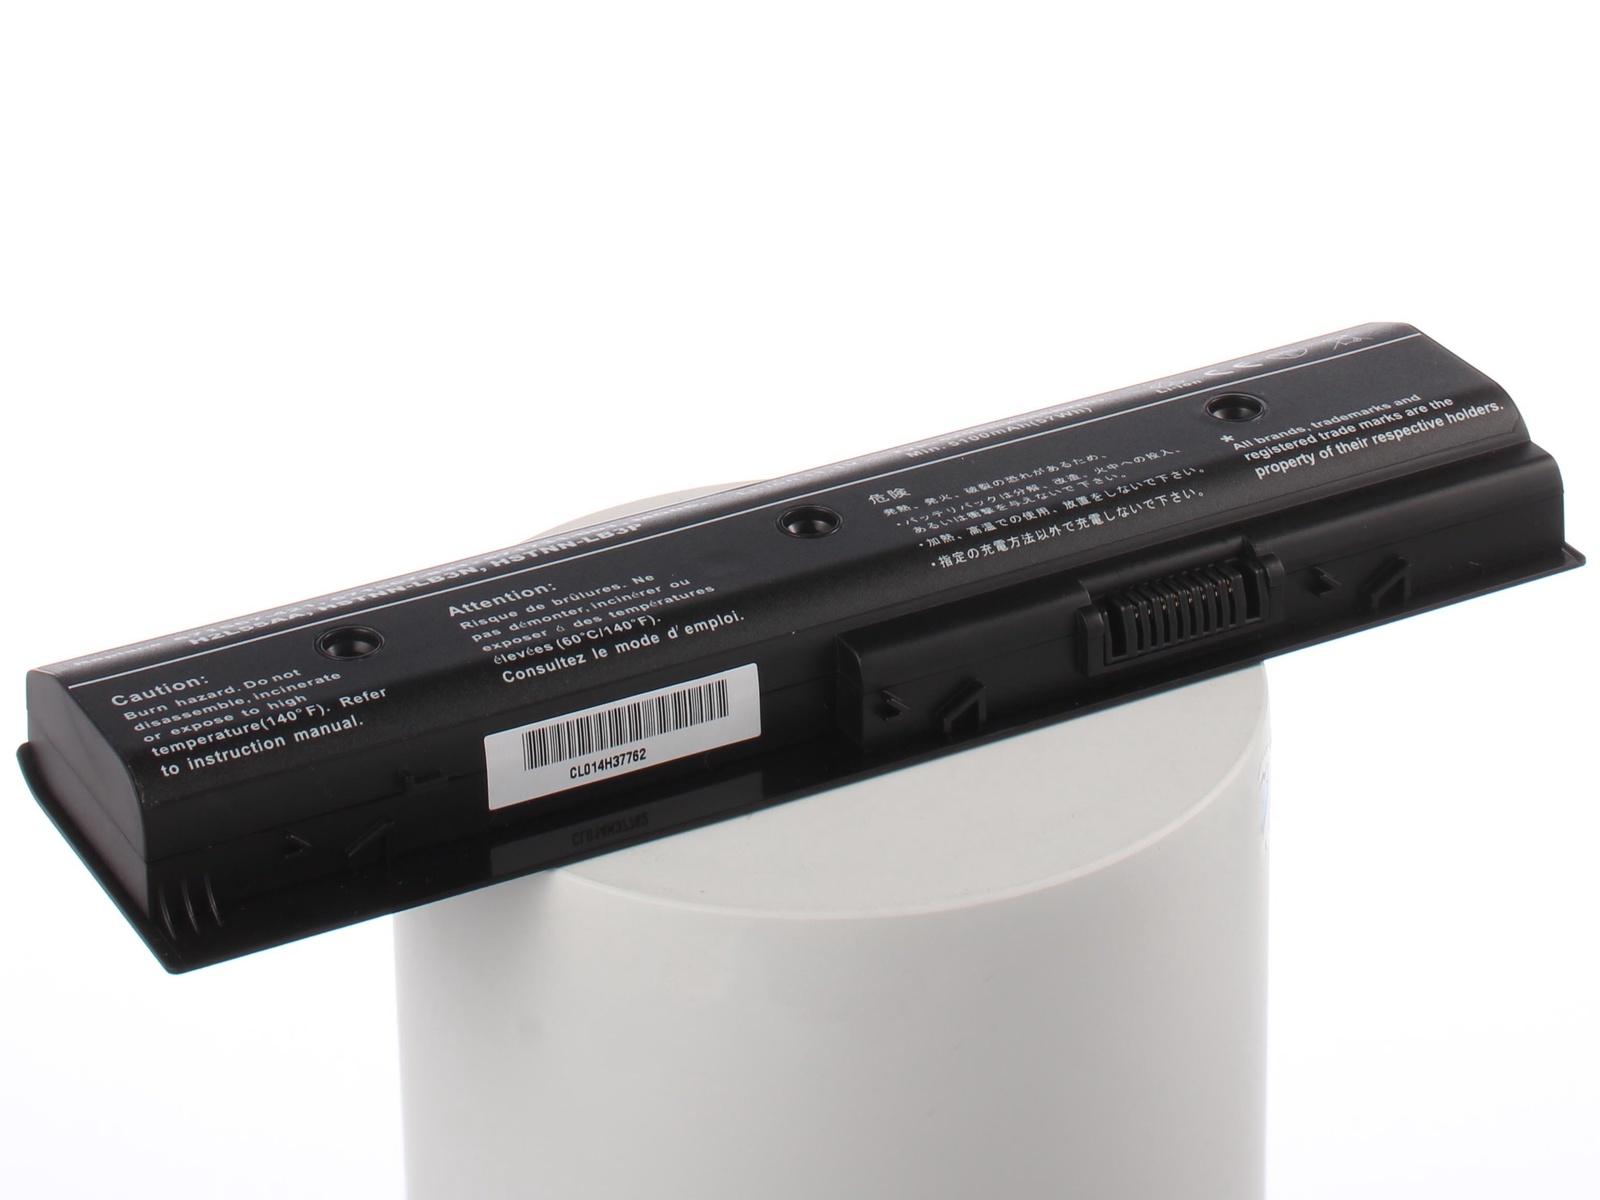 Аккумулятор для ноутбука iBatt для HP-Compaq ENVY TouchSmart 15-j151sr, Envy 15-j100, Envy dv6-7200, Envy dv7-7200, Pavilion dv6-7050er, Pavilion dv6-7057er, Envy 17-3290nr, ENVY dv7-7351er, ENVY m6-1102er, ENVY m6-1103er аккумулятор для ноутбука ibatt для hp compaq envy sleekbook 4 1150er envy 4 1260er envy 4 1272er envy sleekbook 4 1055er envy 4 1000 envy 4 1200 envy 4 1152sr envy touchsmart 4 1272er envy 4 1050er envy 4 1052er